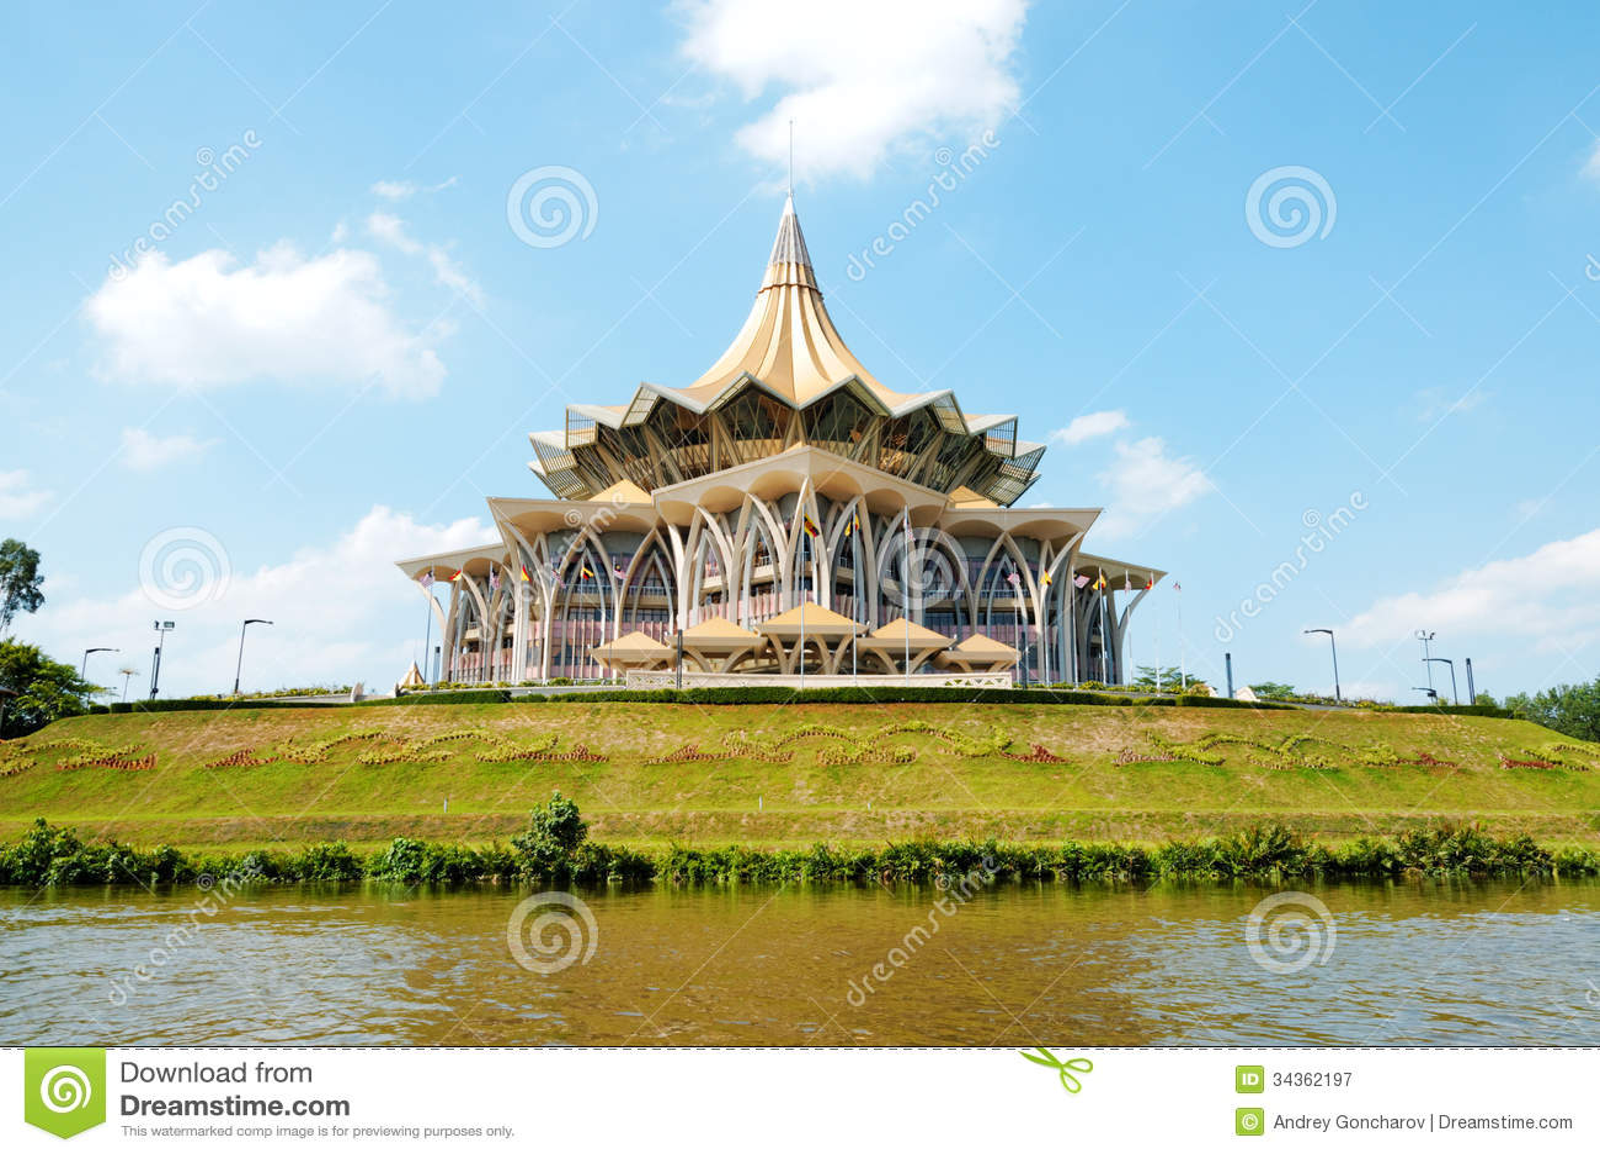 Dun Building In Kuching Borneo Malaysia Stock Image